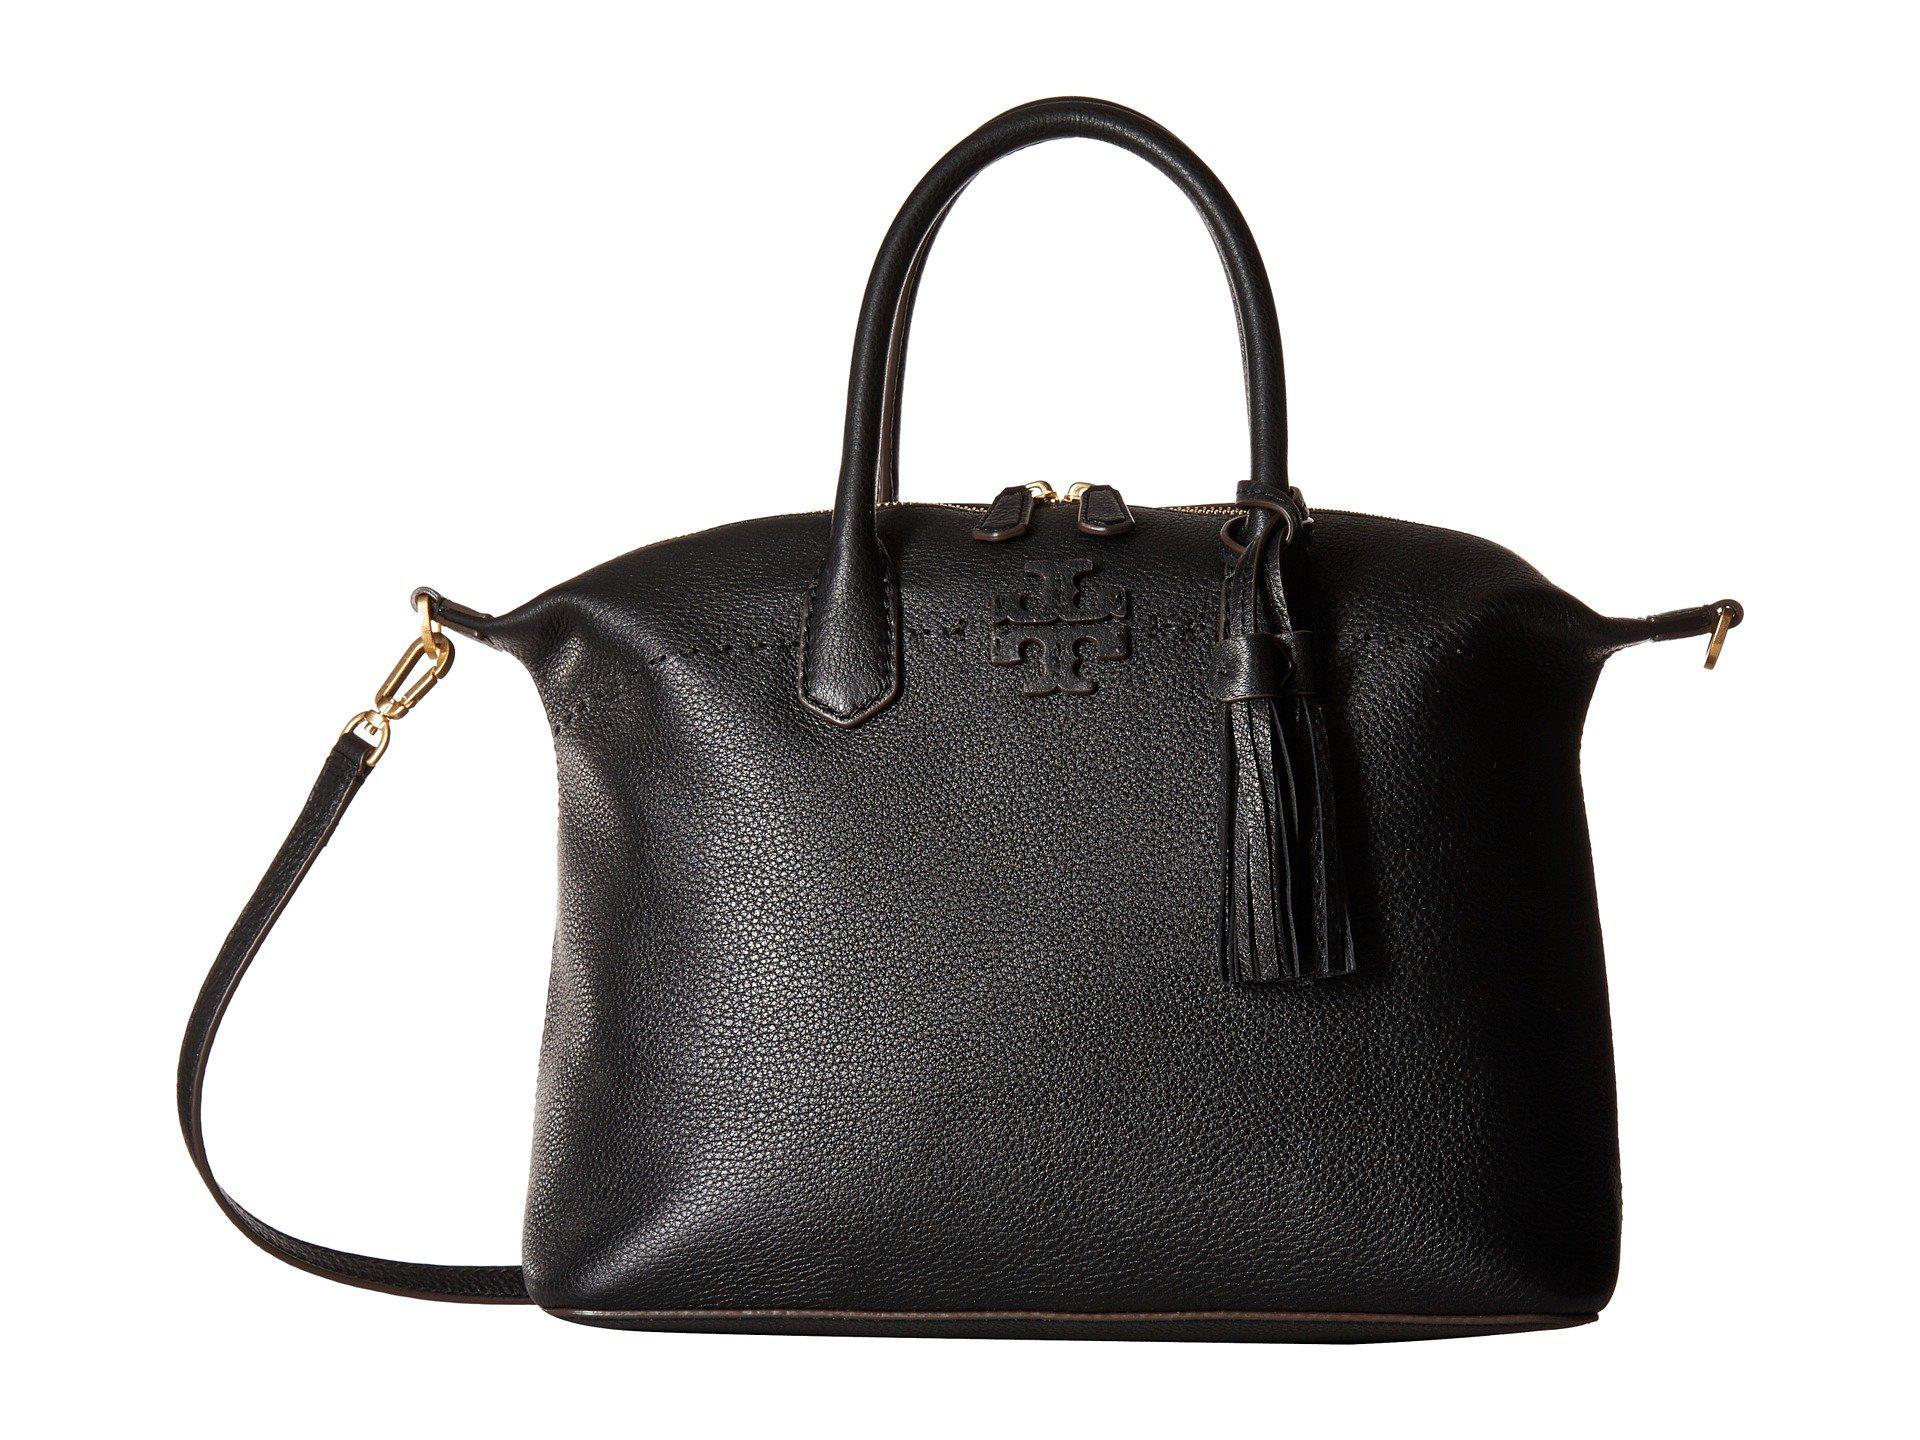 b51ce7c812b4 Lyst - Tory Burch Mcgraw Slouchy Satchel (black) Satchel Handbags in ...